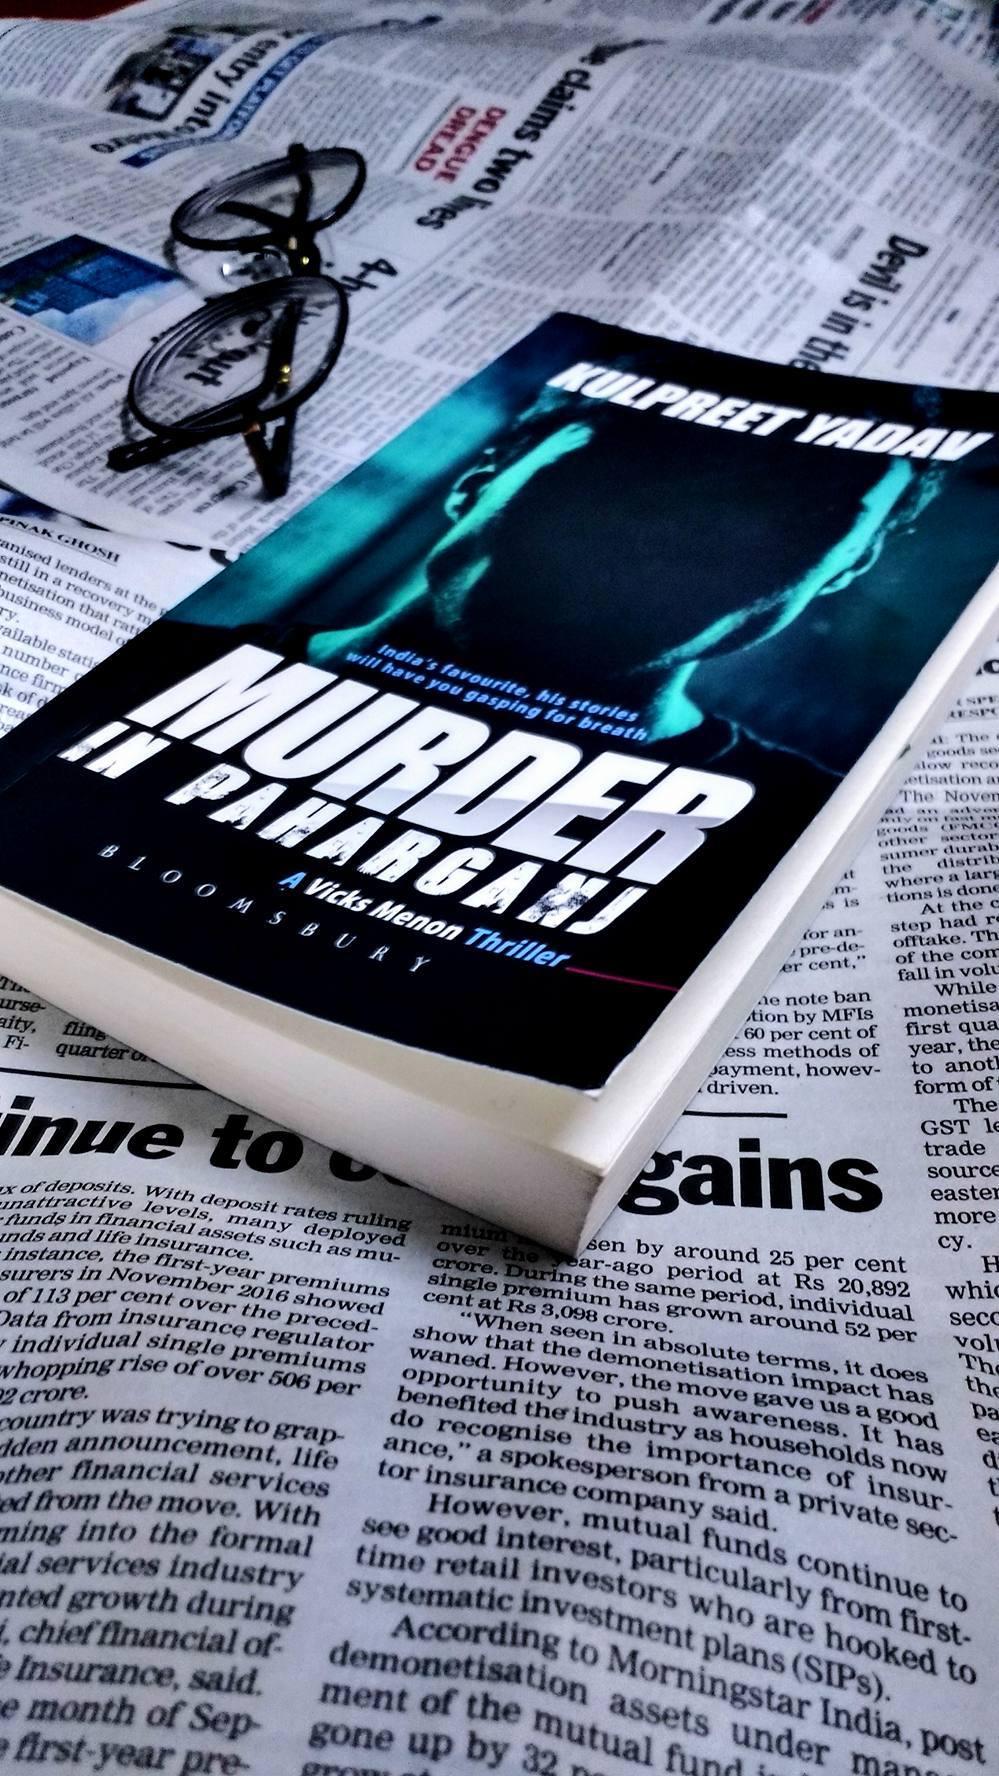 Murder in Paharganj by KulpreetYadav